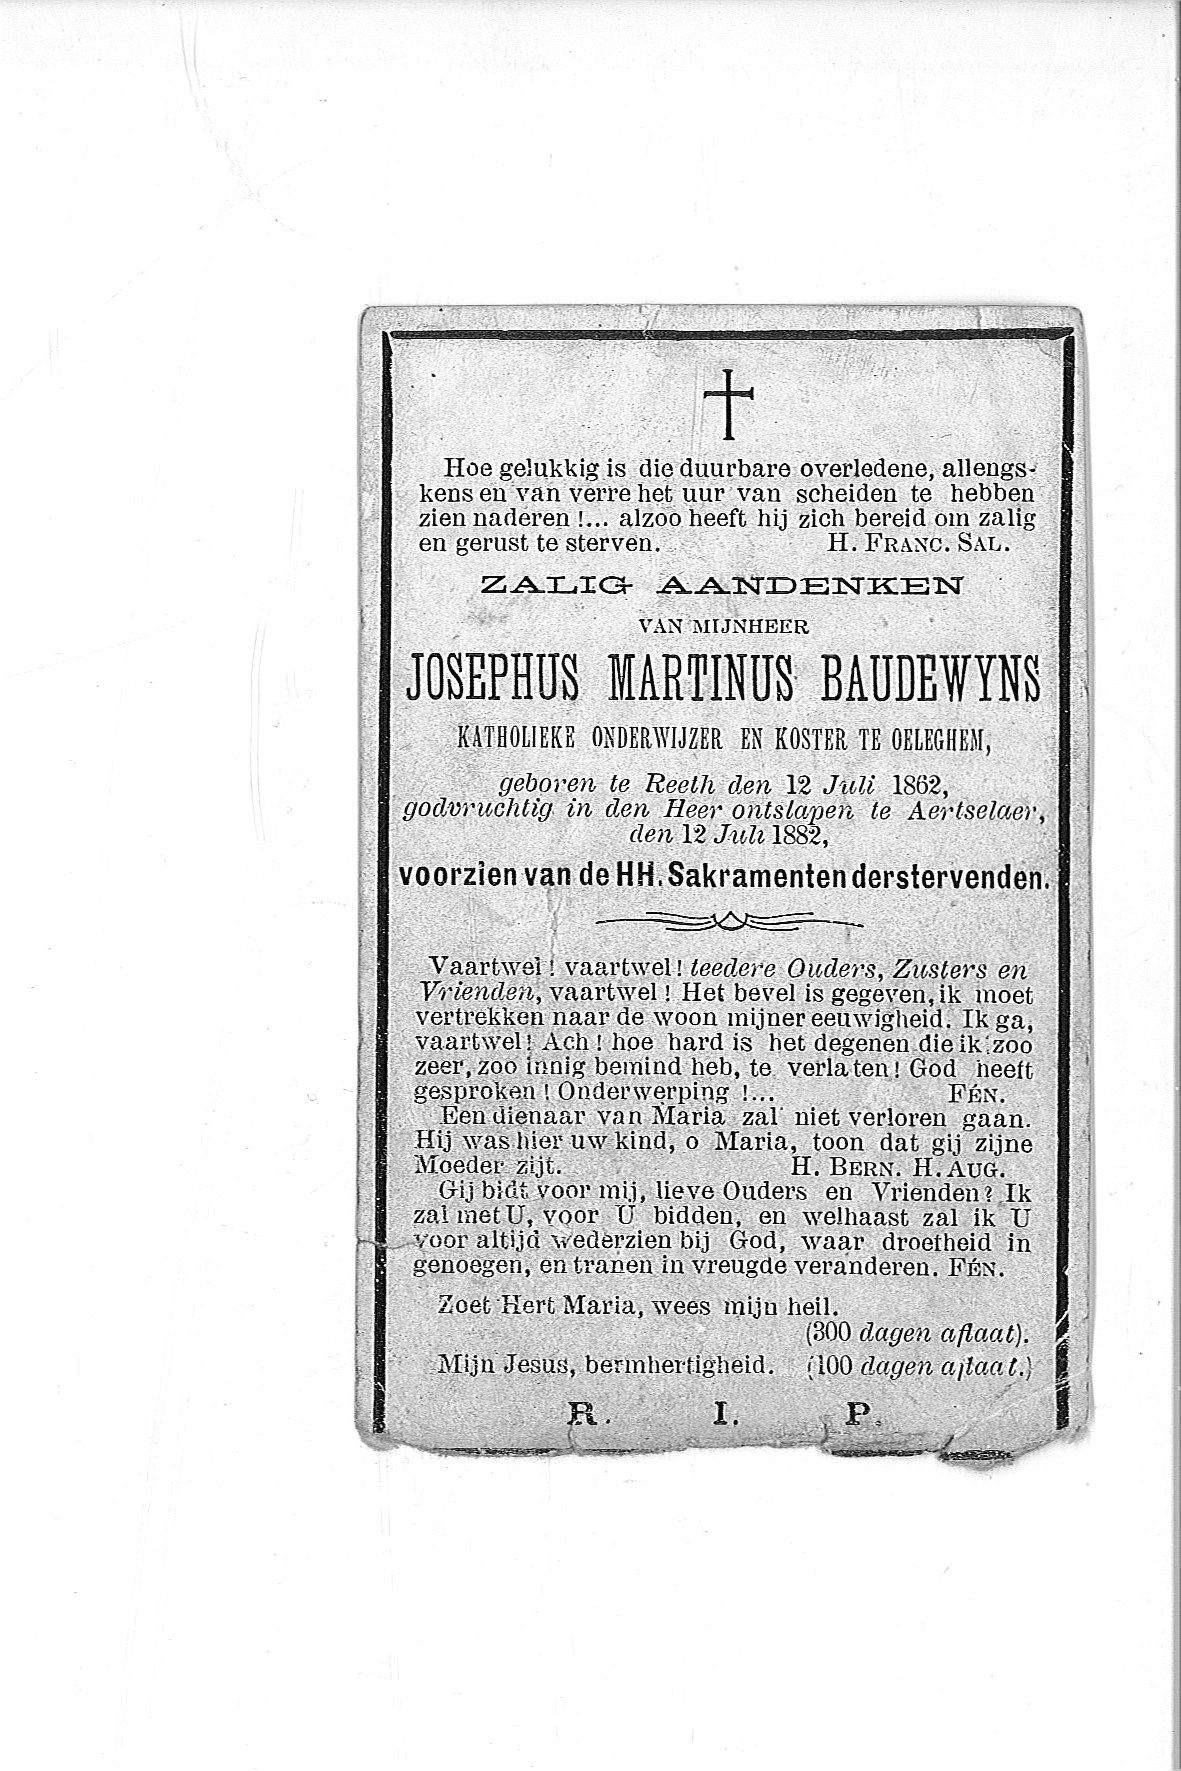 josephus-martinus(1882)20090709111312_00001.jpg